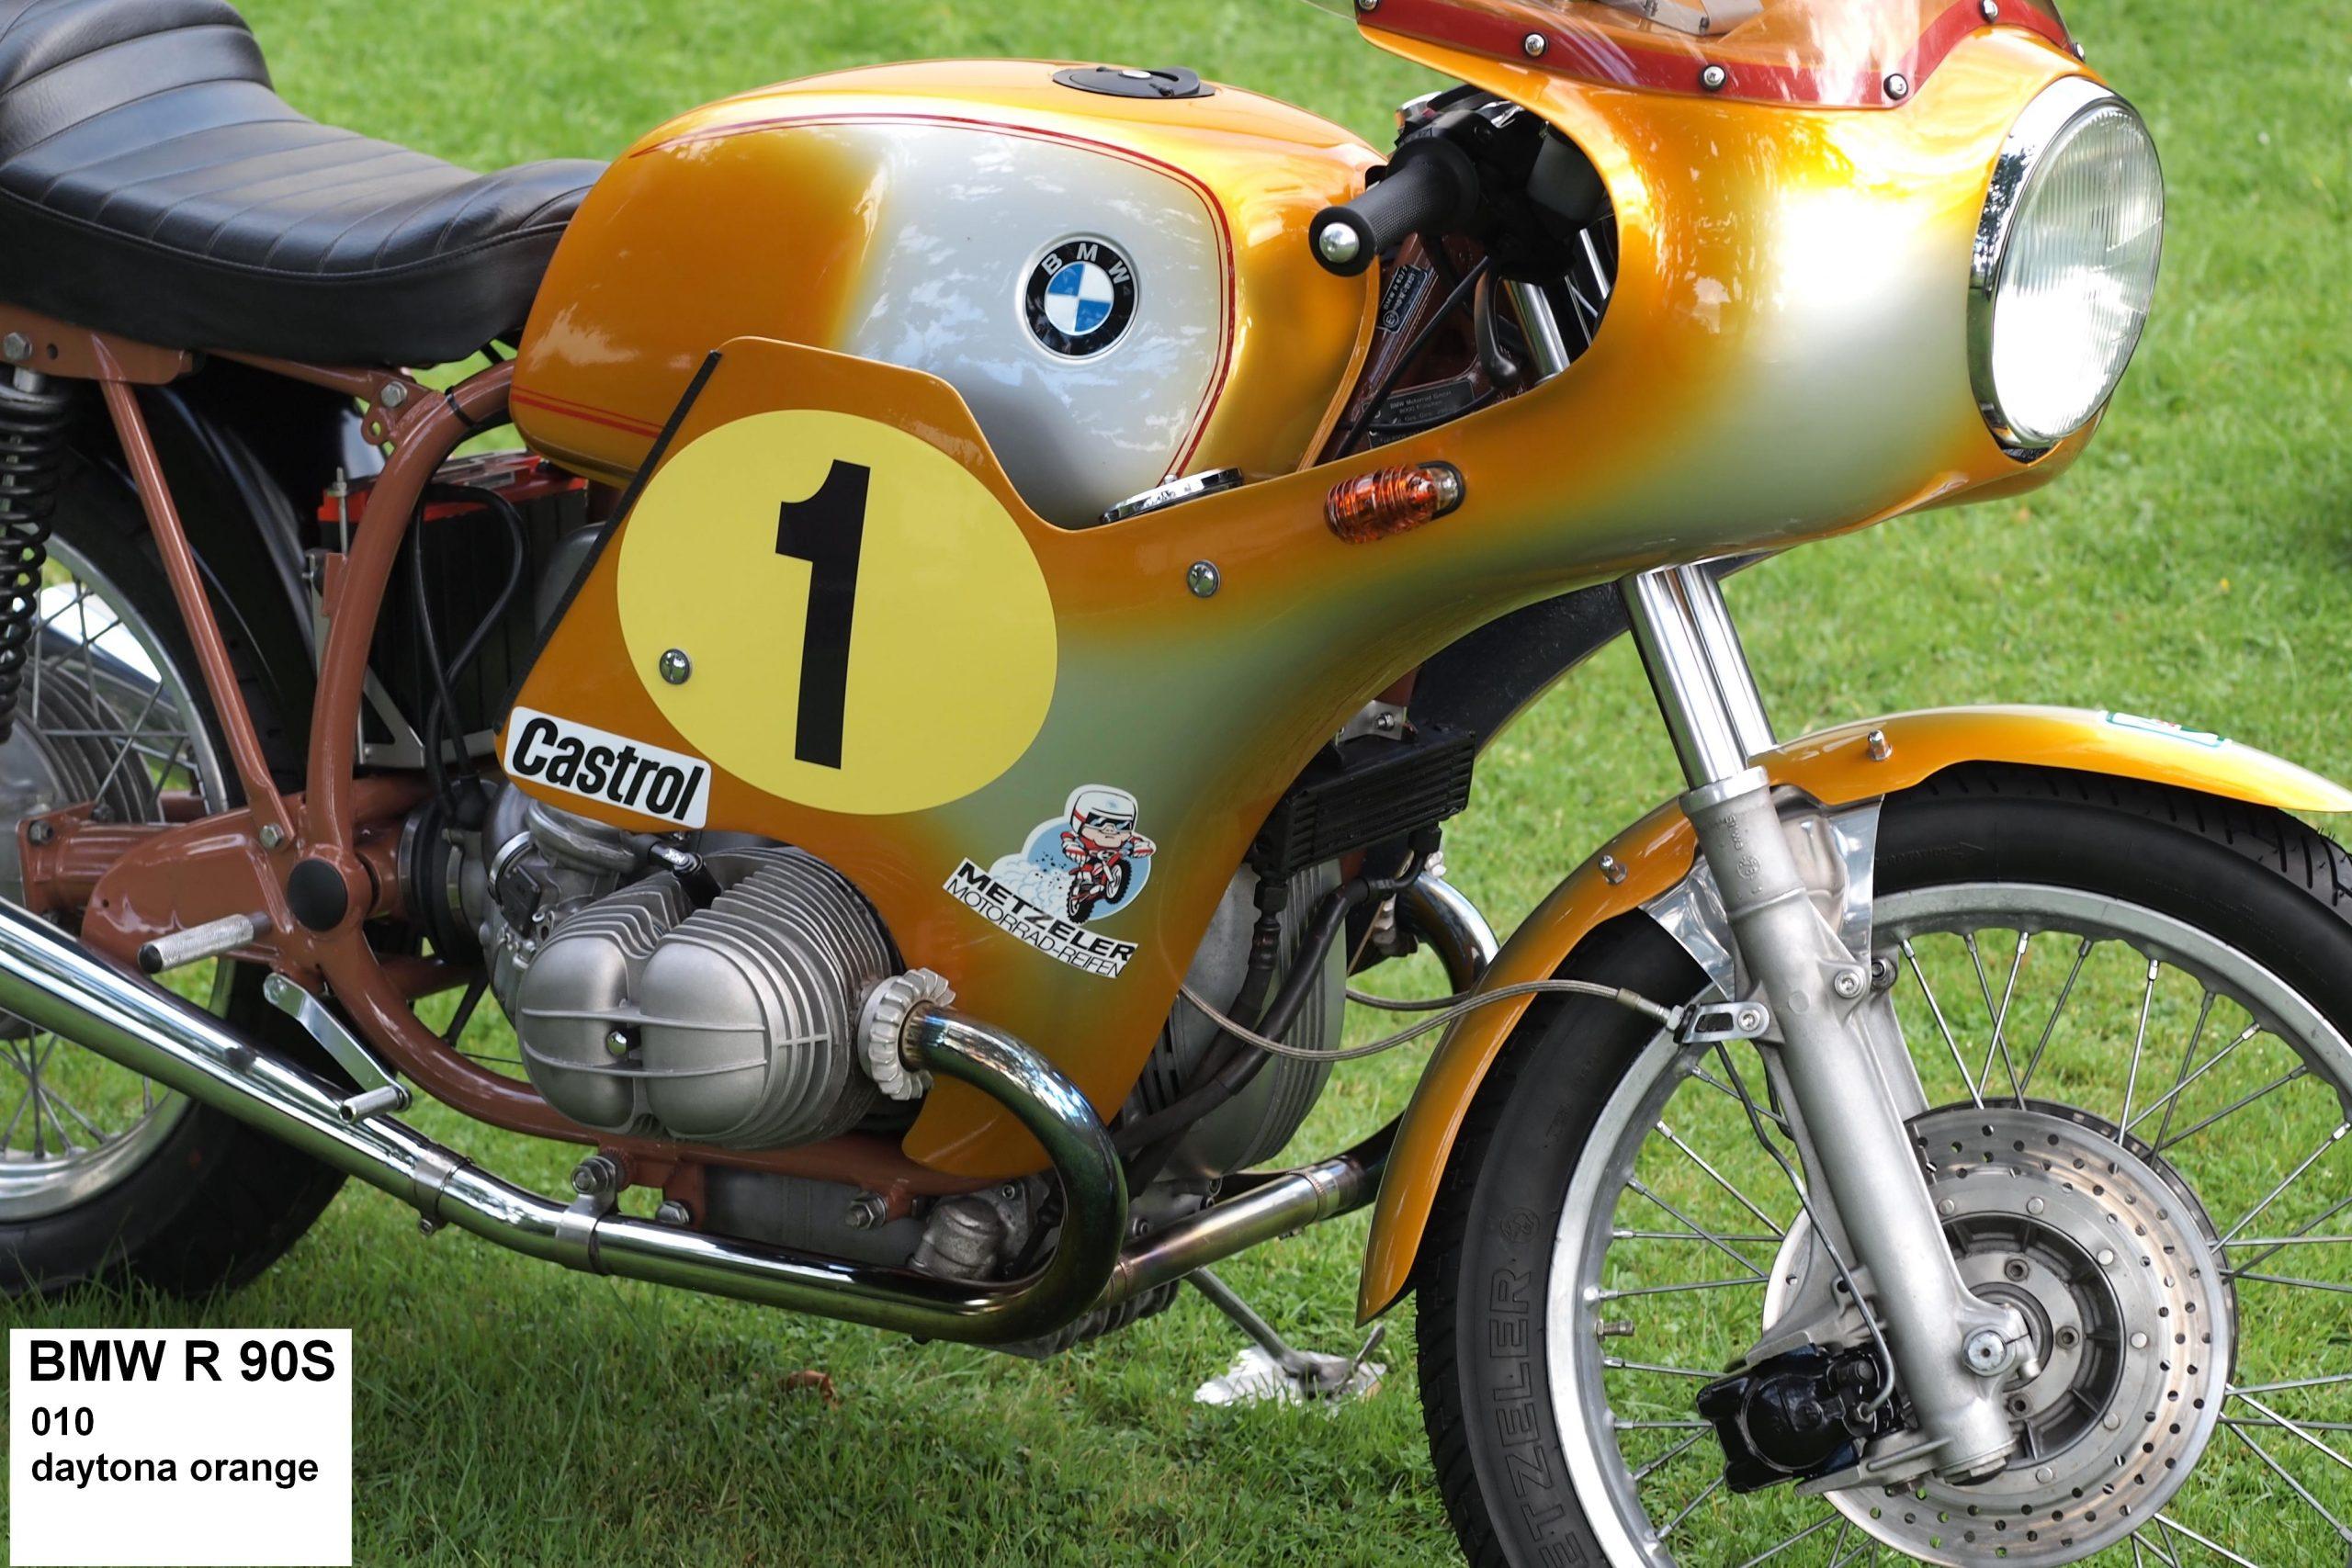 BMW R90S in daytona orange 010 RH-Lacke Lackiererei Motorradlackierung